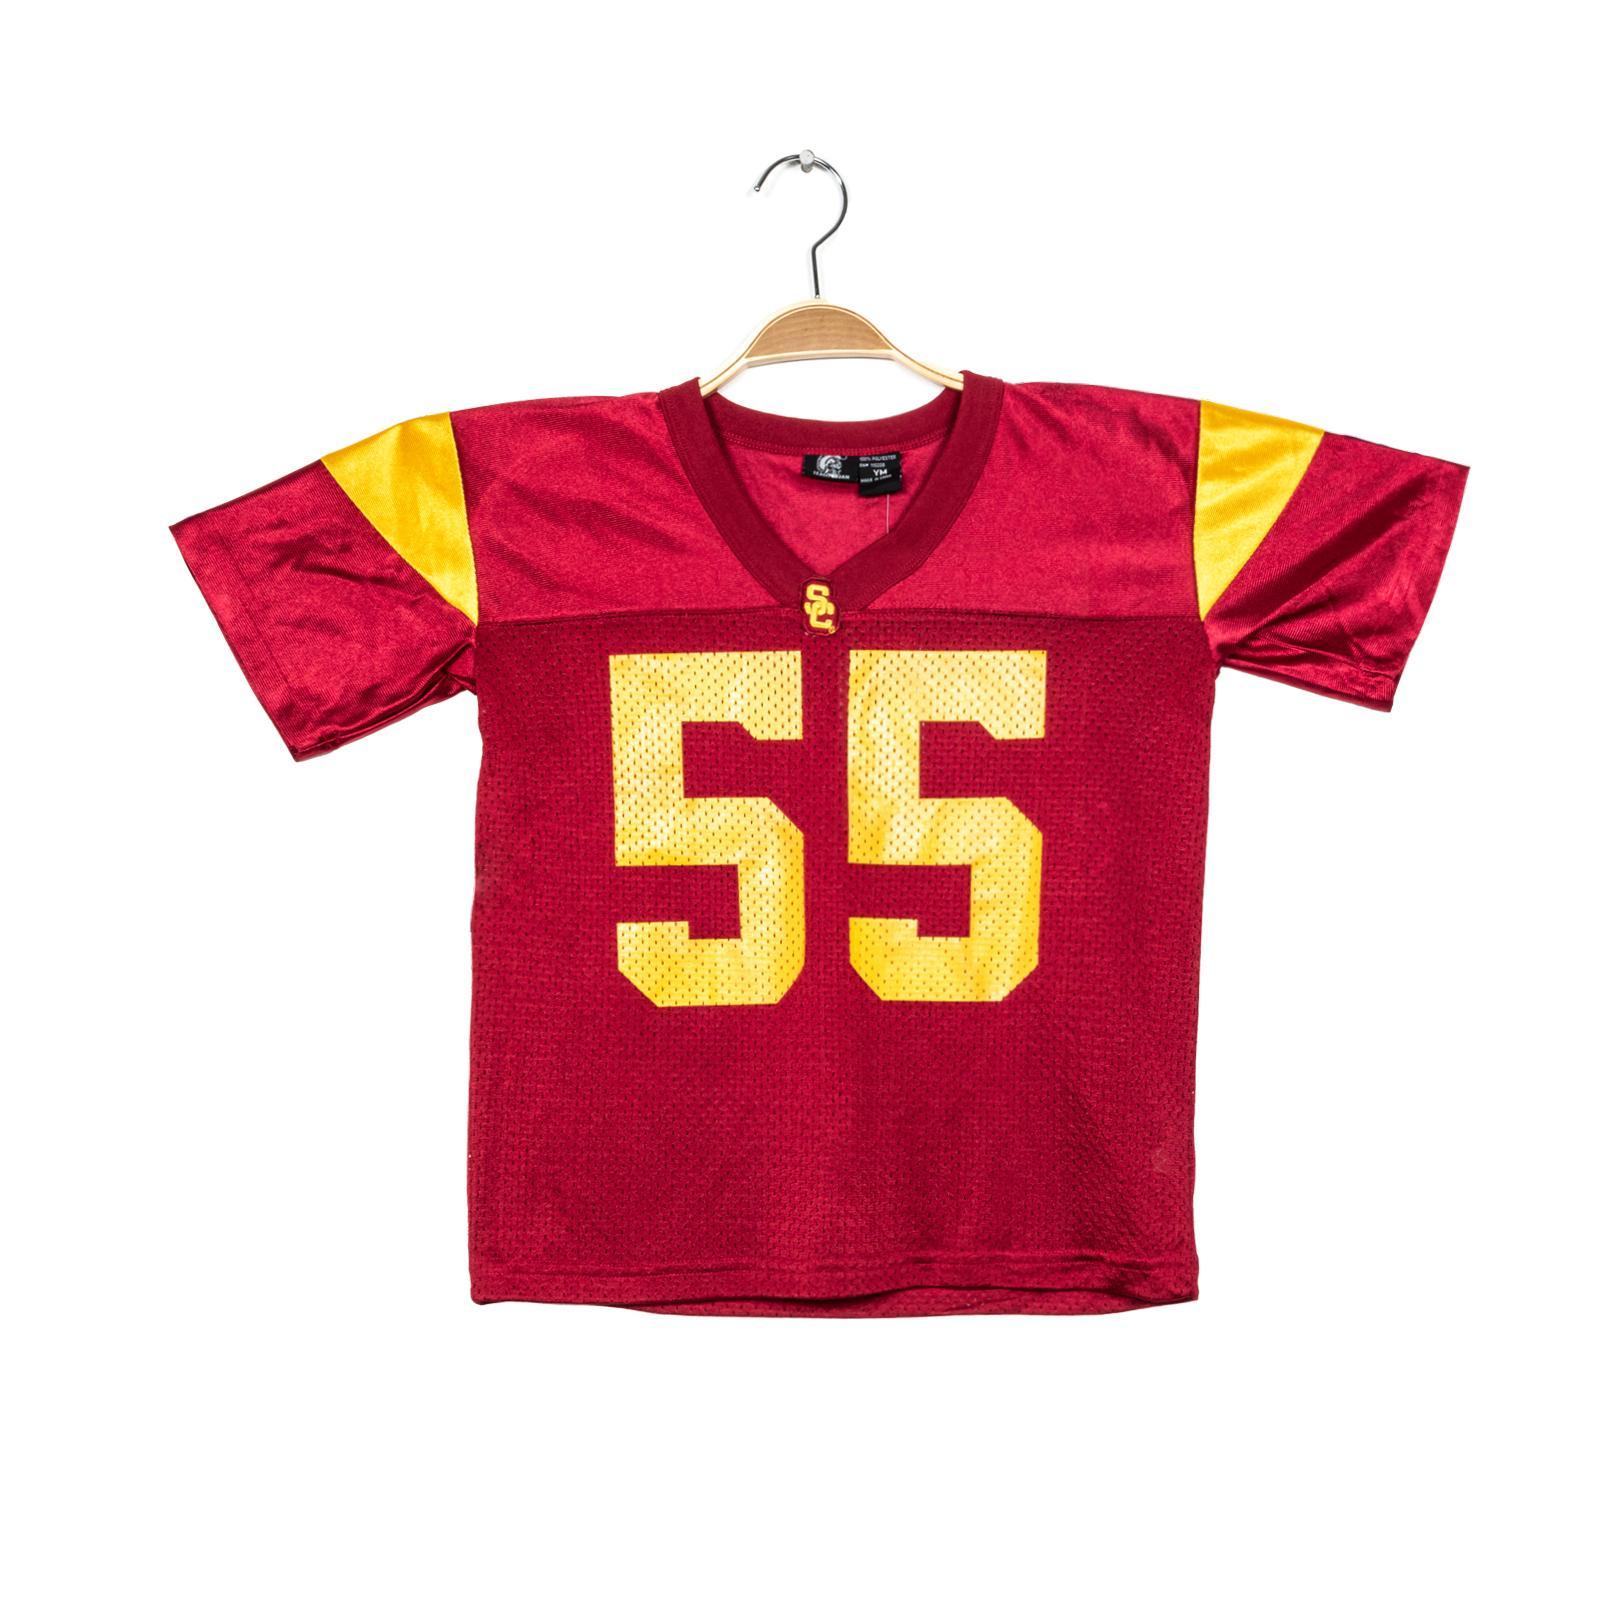 jerseys u0026 cheer